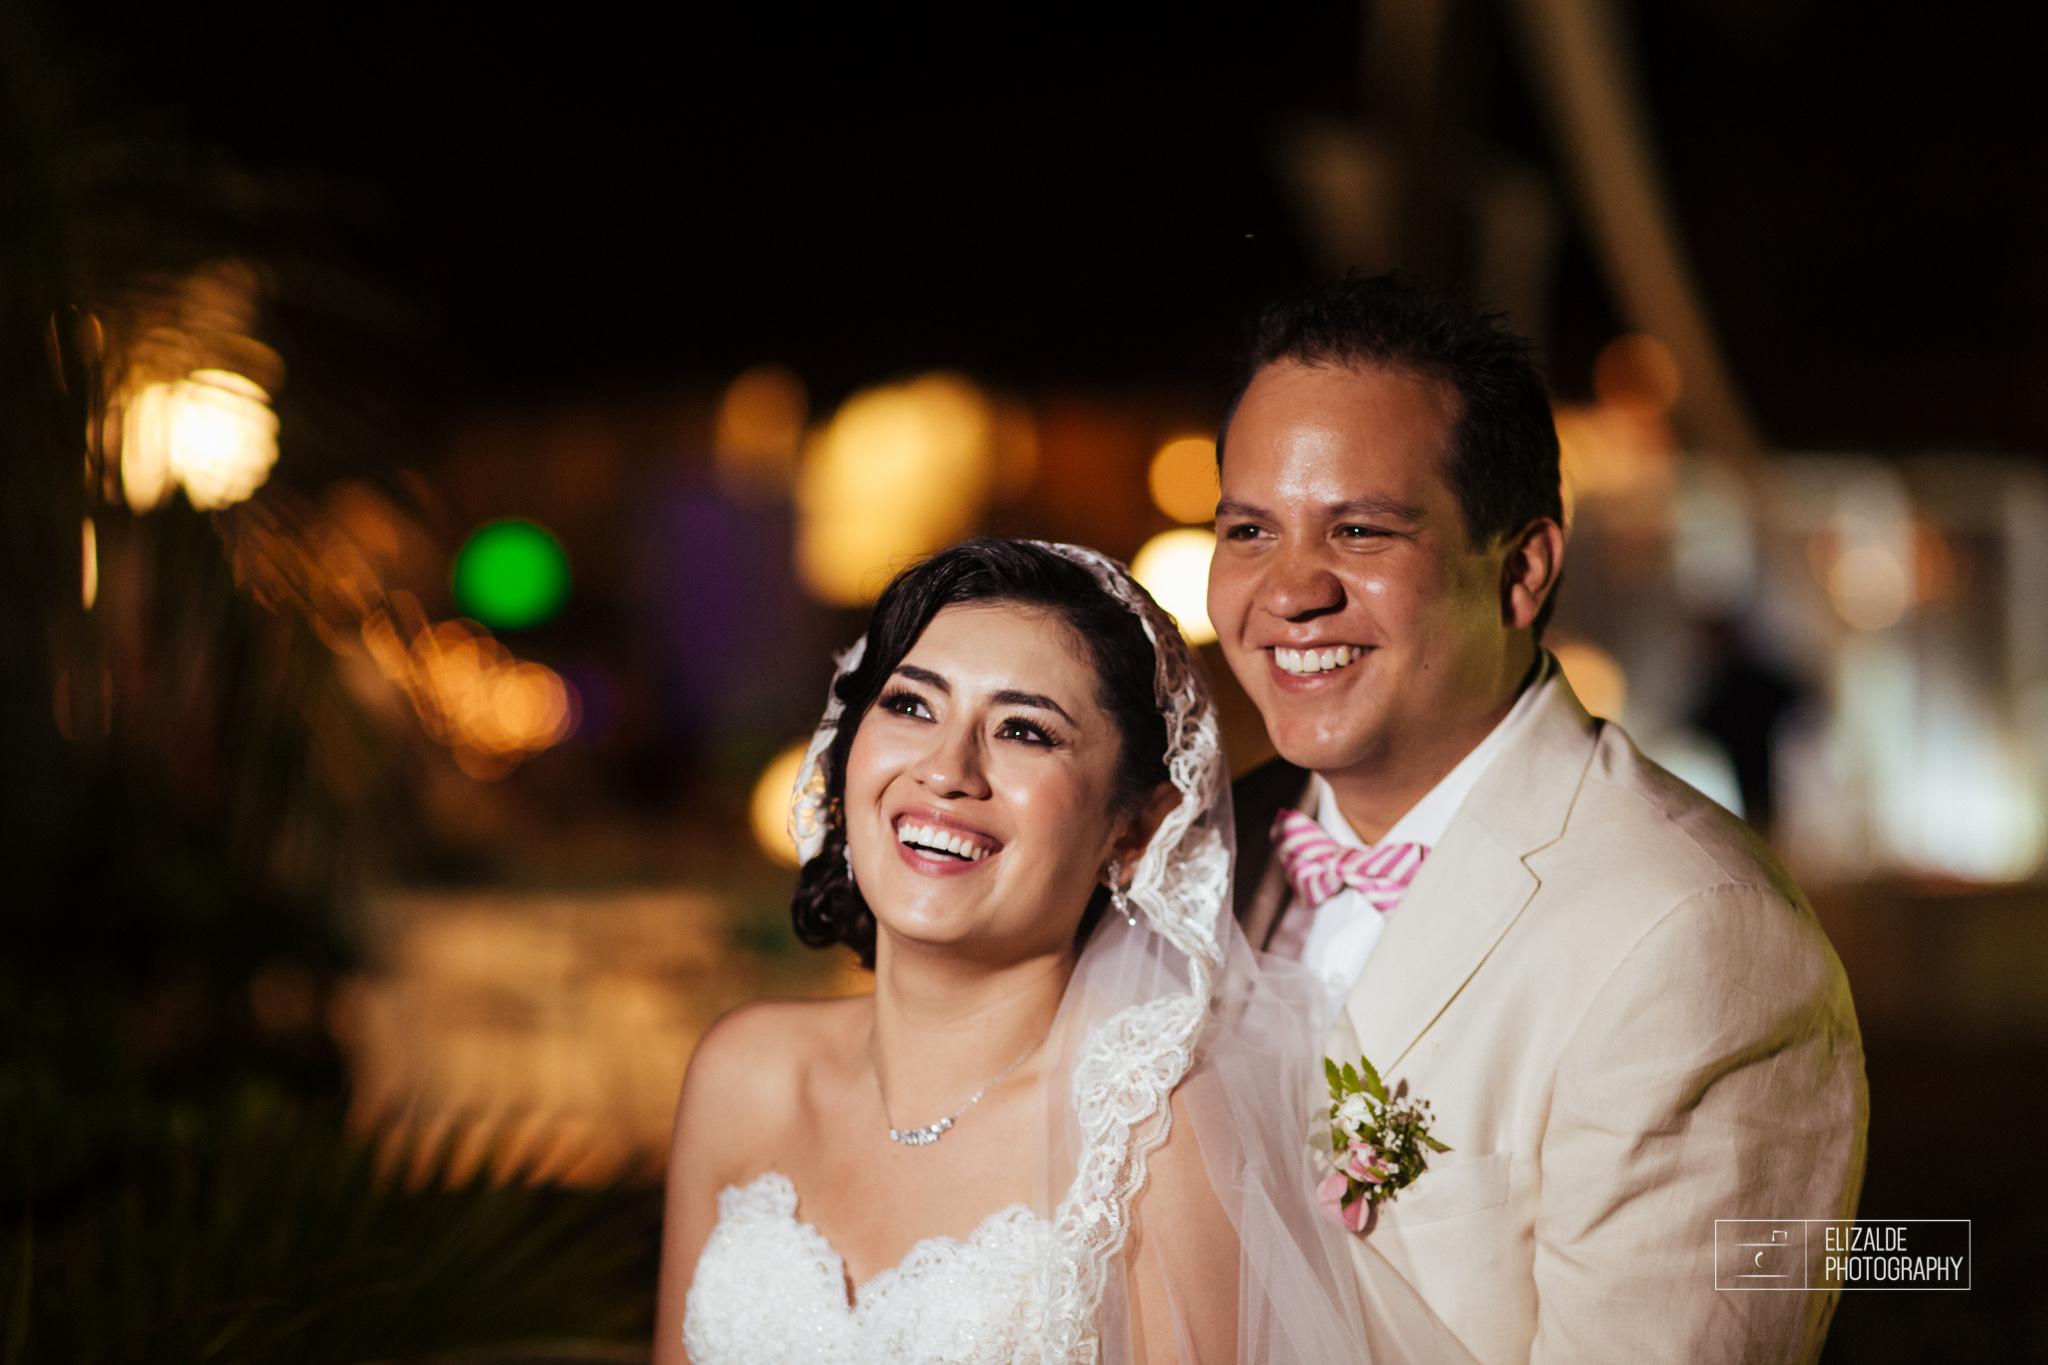 Pay and Ferran_Acapulco_Destination Wedding_Elizalde Photography-108.jpg